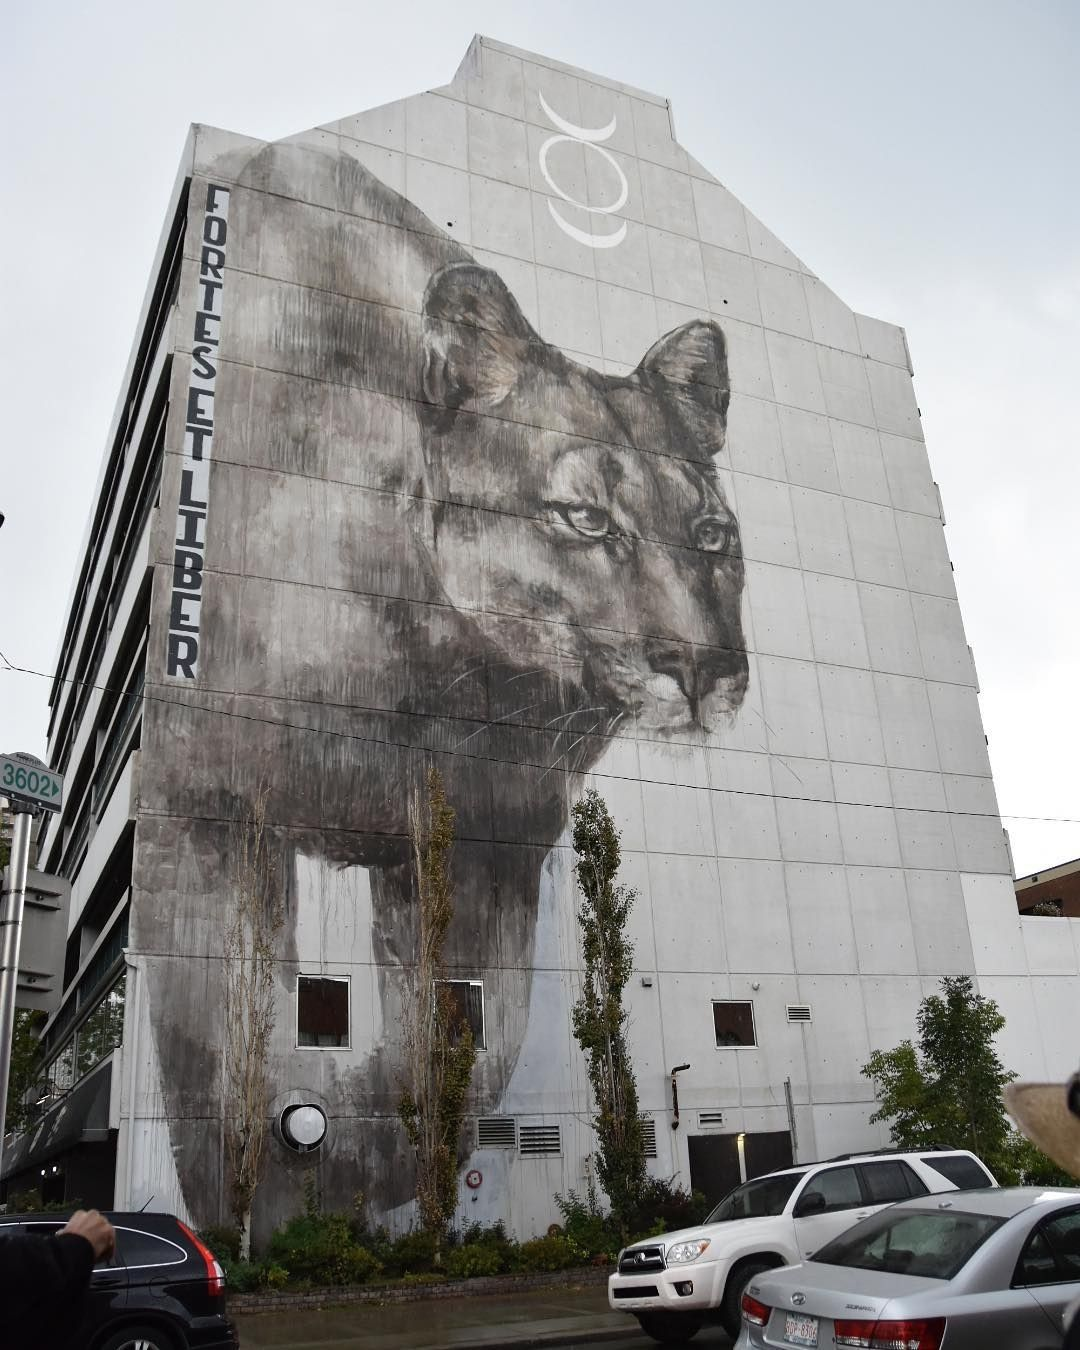 3d street art street art graffiti street artists